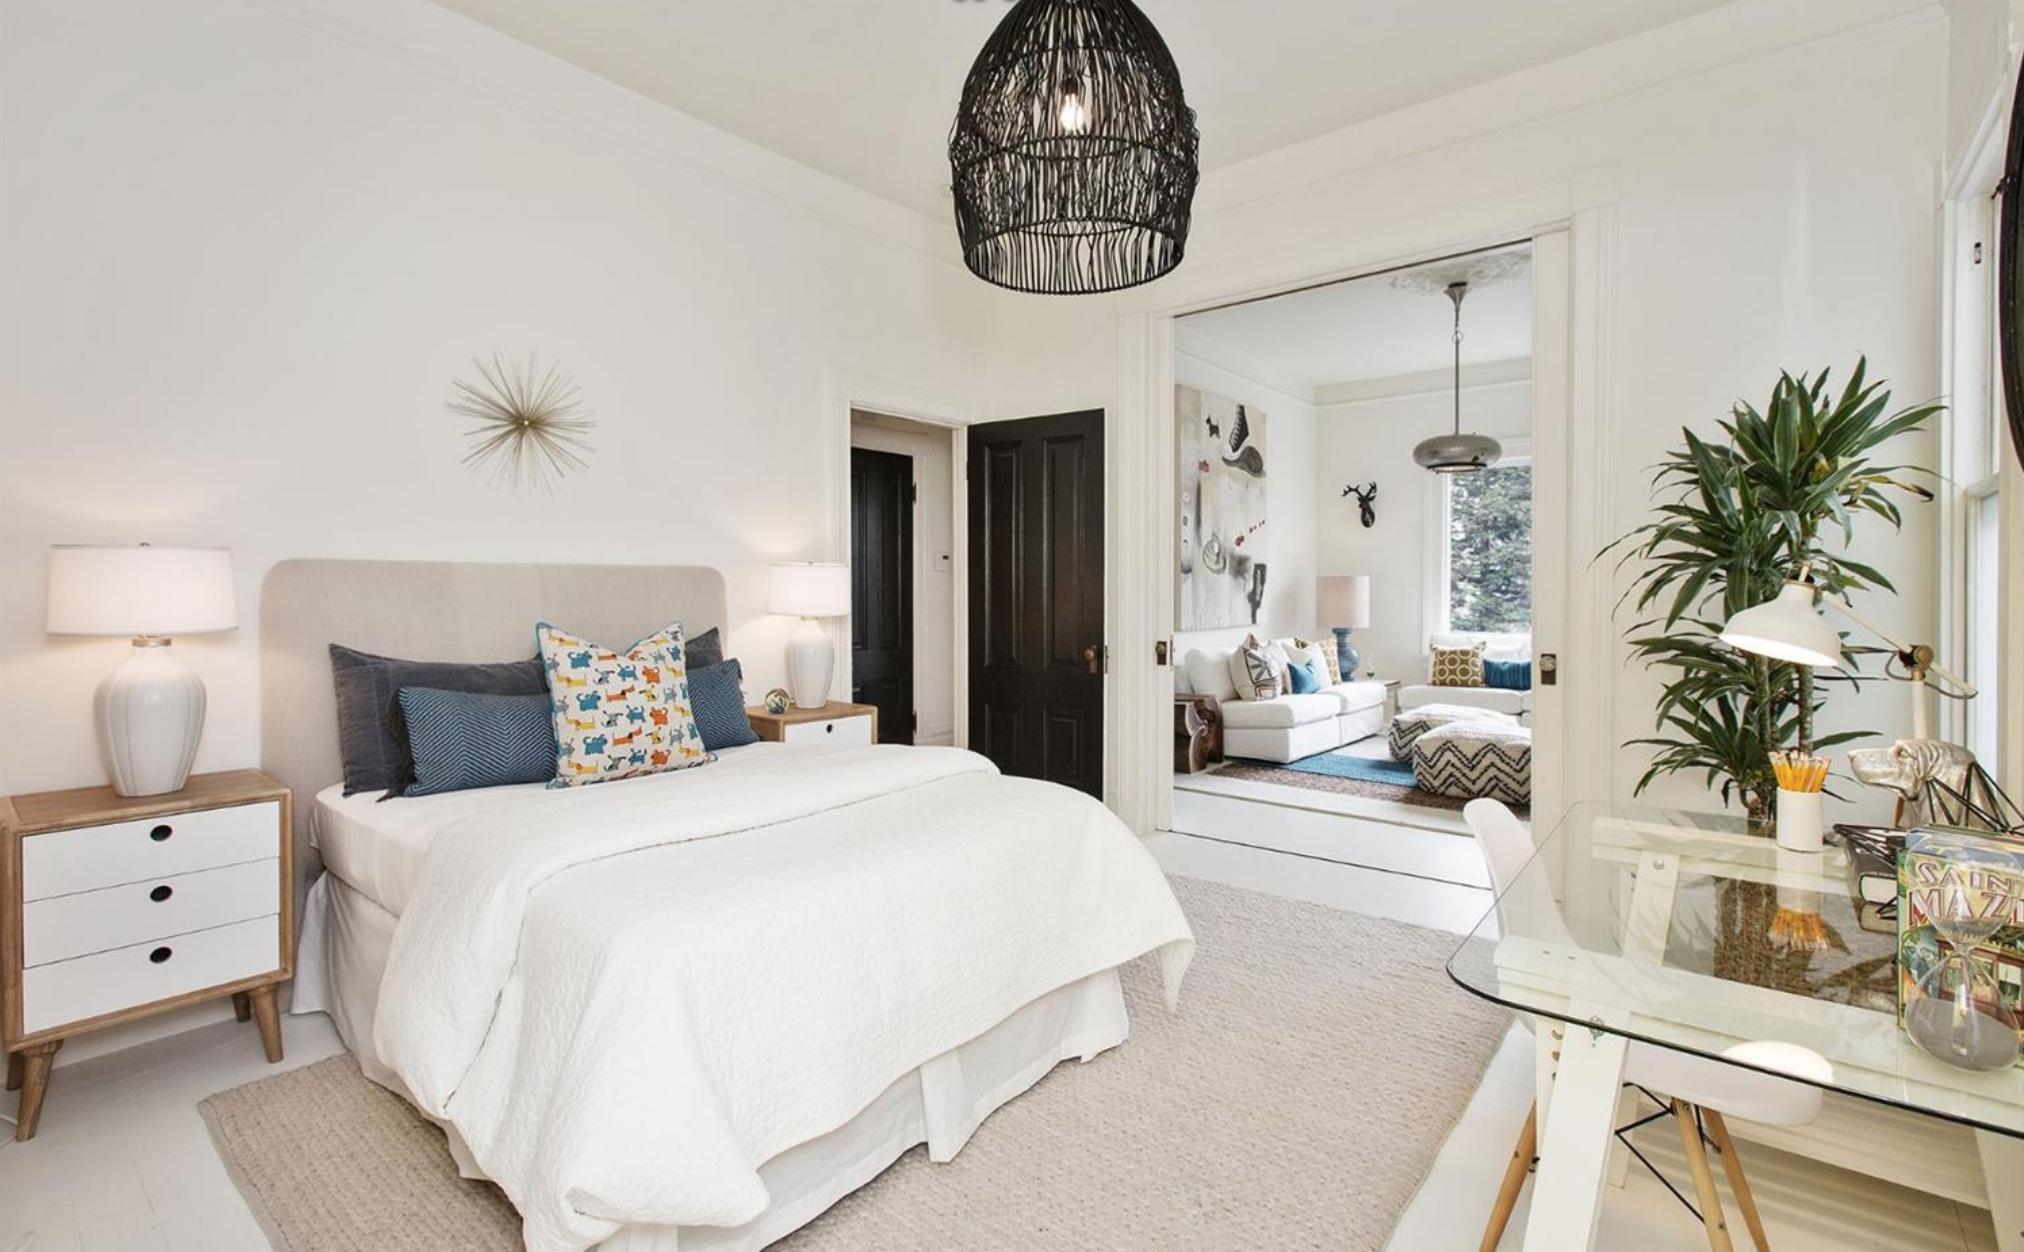 3880 Sacramento St - 3rd Bedroom